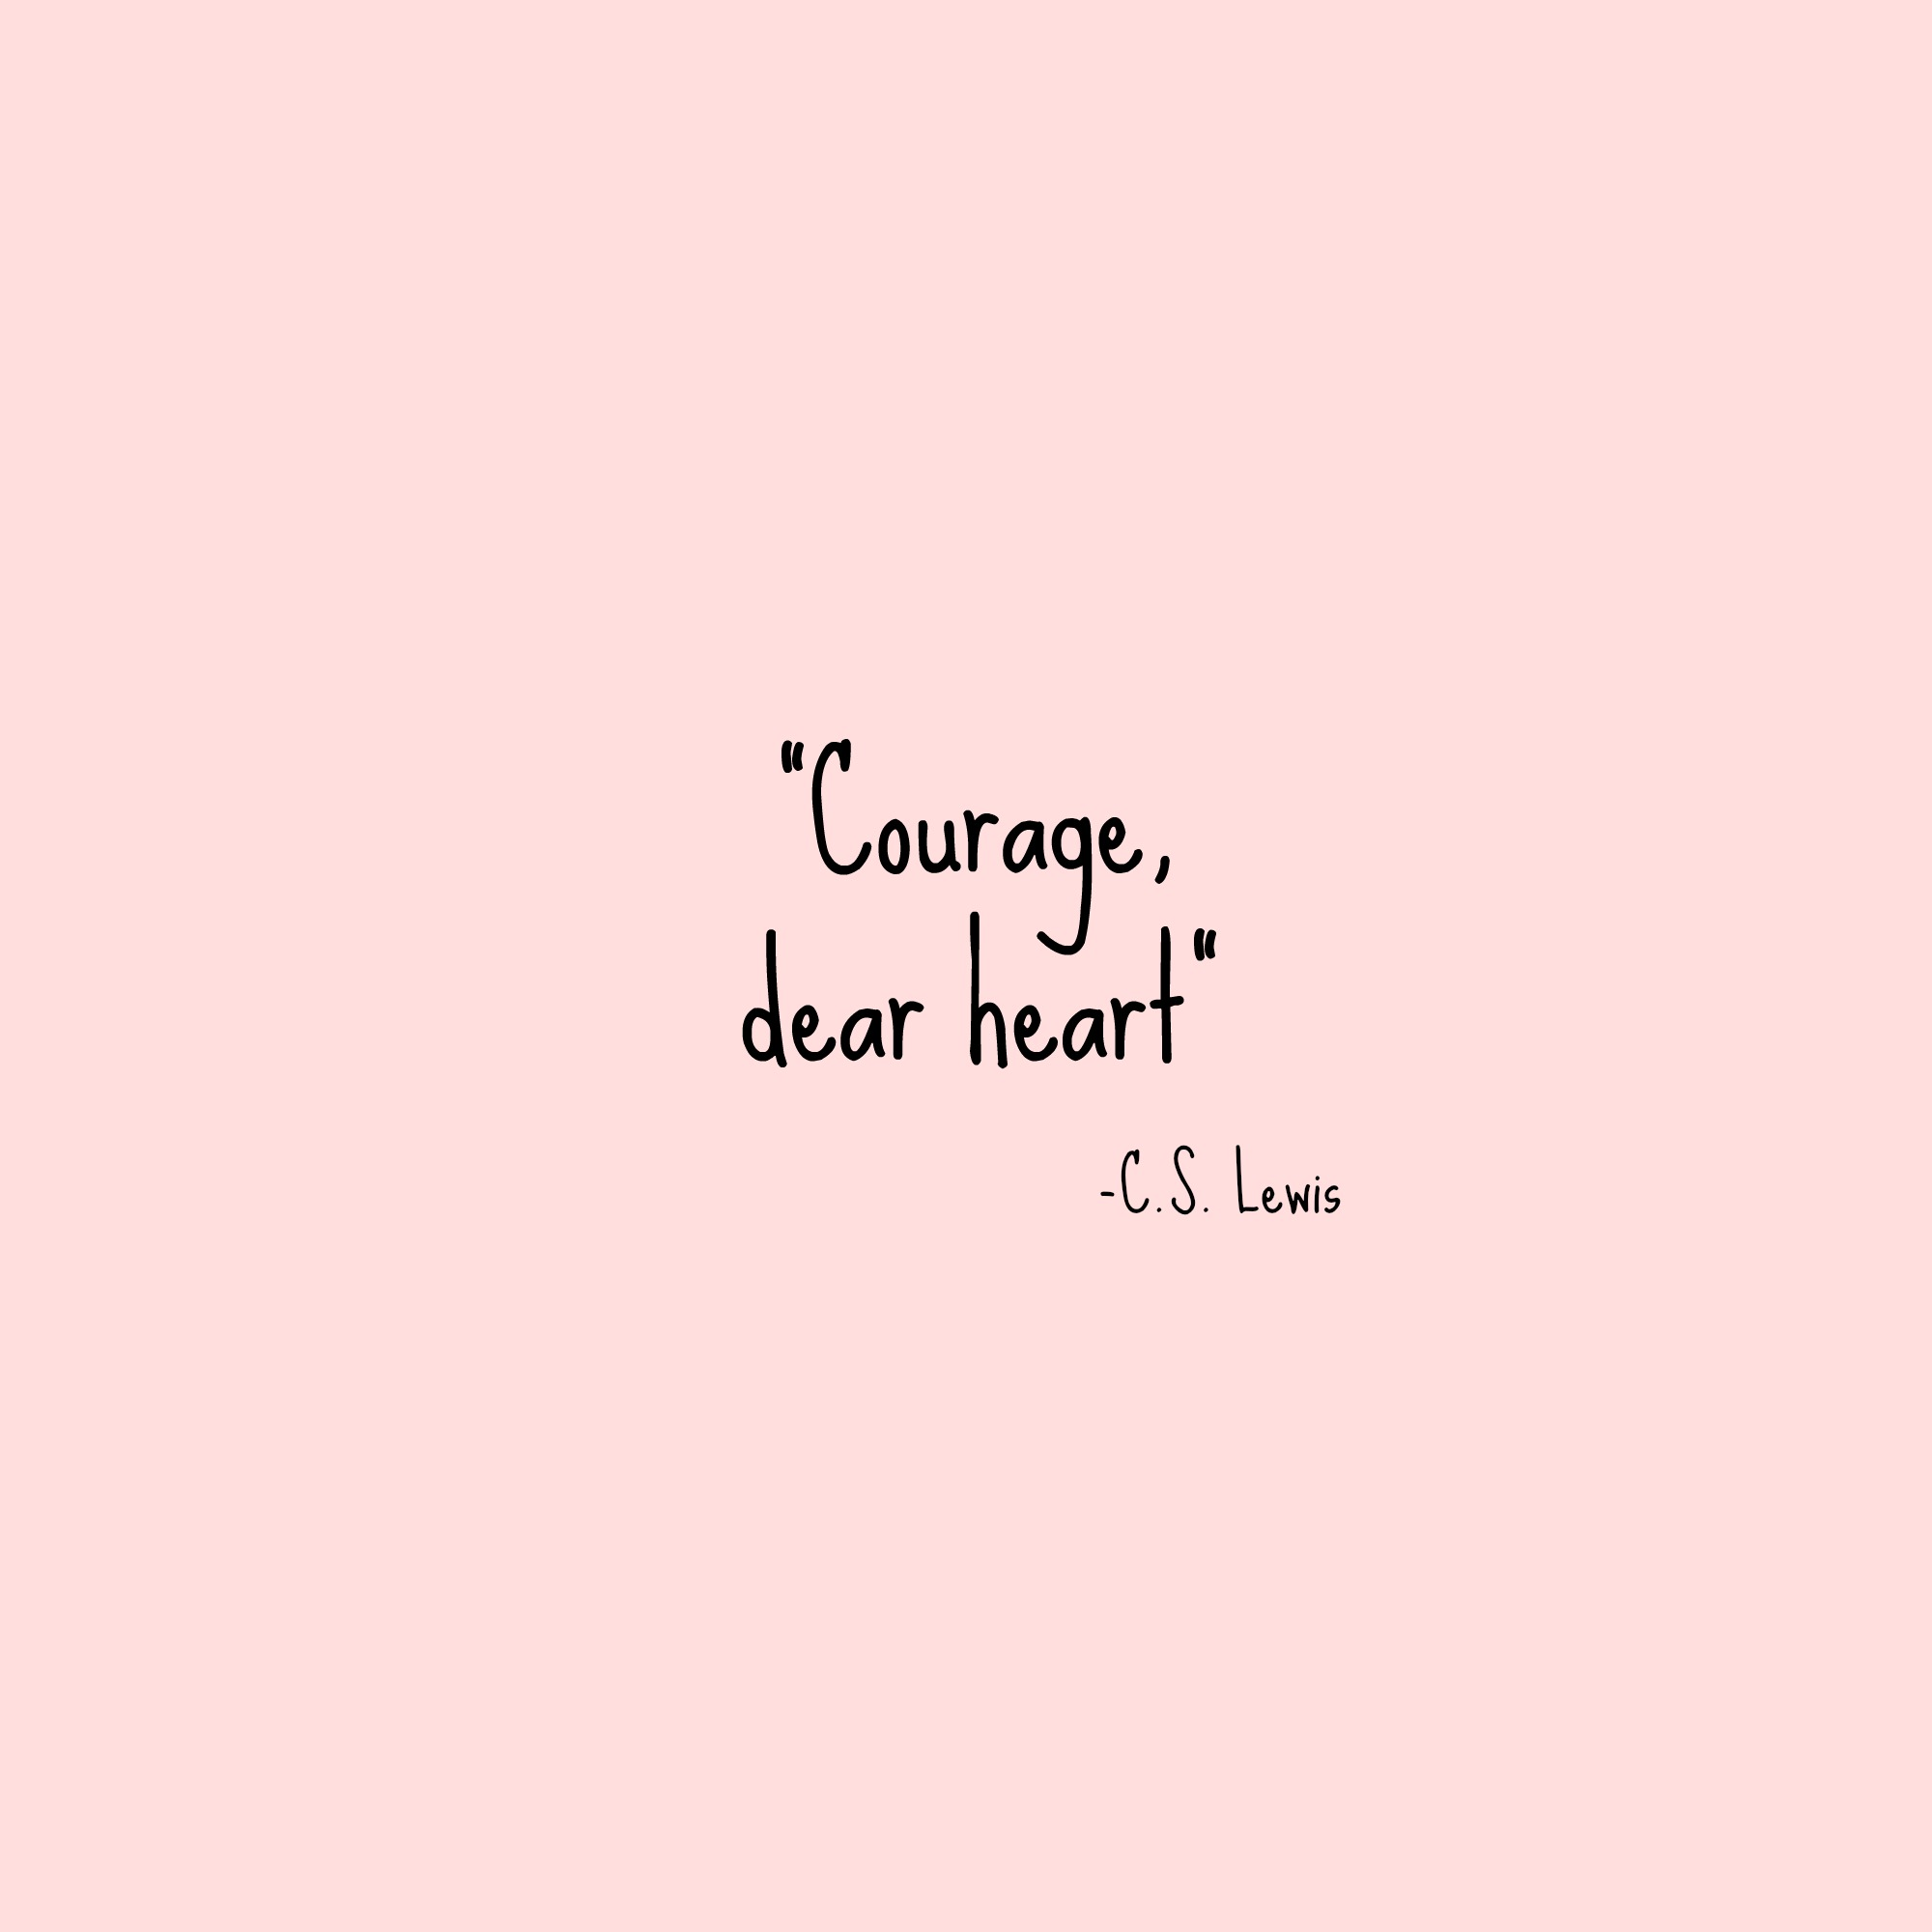 Good Quotes Wallpaper For Facebook Courage Dear Heart